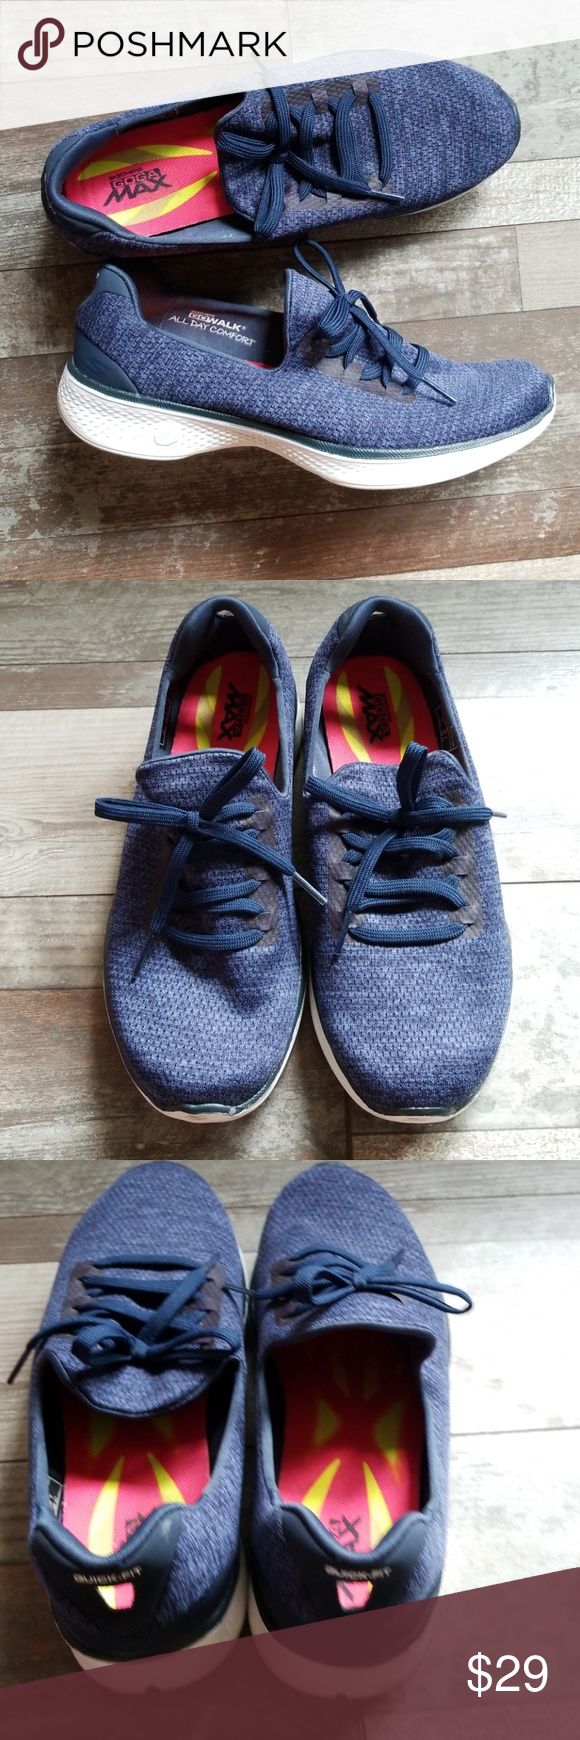 f3724a05fb8c6 Skechers goga max quick fit sneakers size 7.5 Super cute Skechers goga max  quick fit sneakers. Size 7.5 Skechers Shoes Athletic Shoes